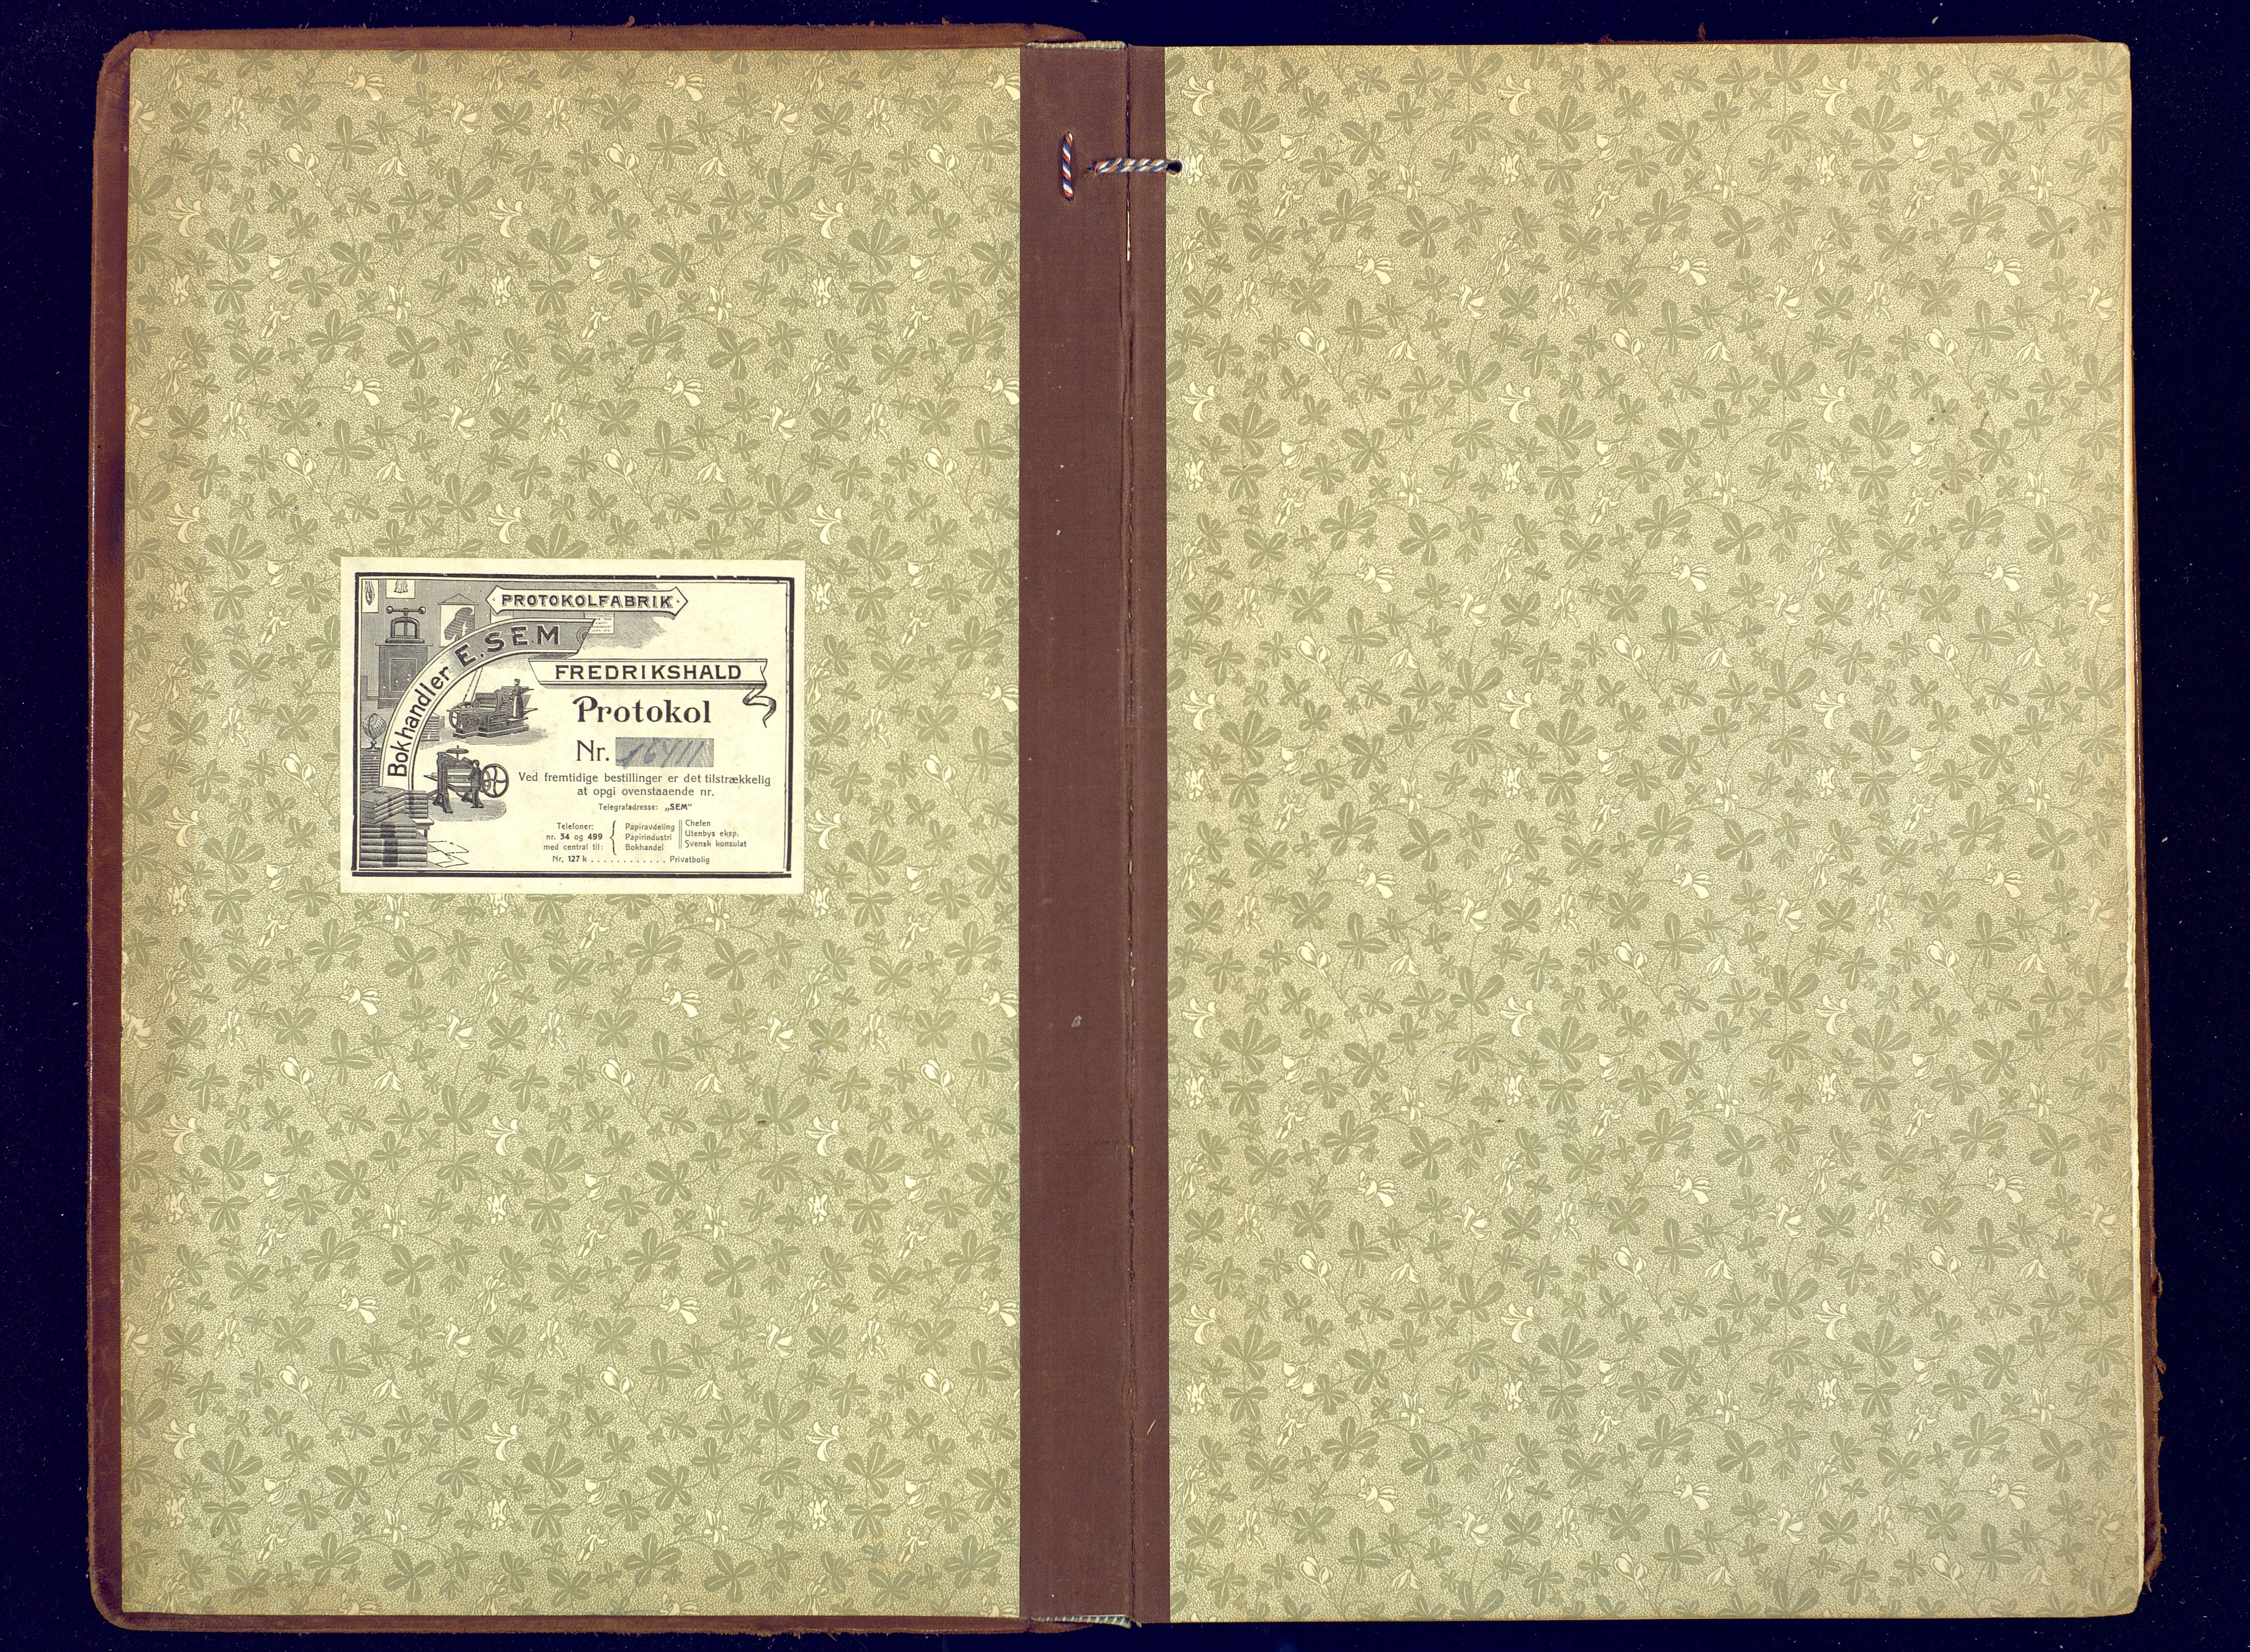 SATØ, Mefjord/Berg sokneprestkontor, G/Ga/Gaa: Ministerialbok nr. 9, 1916-1928